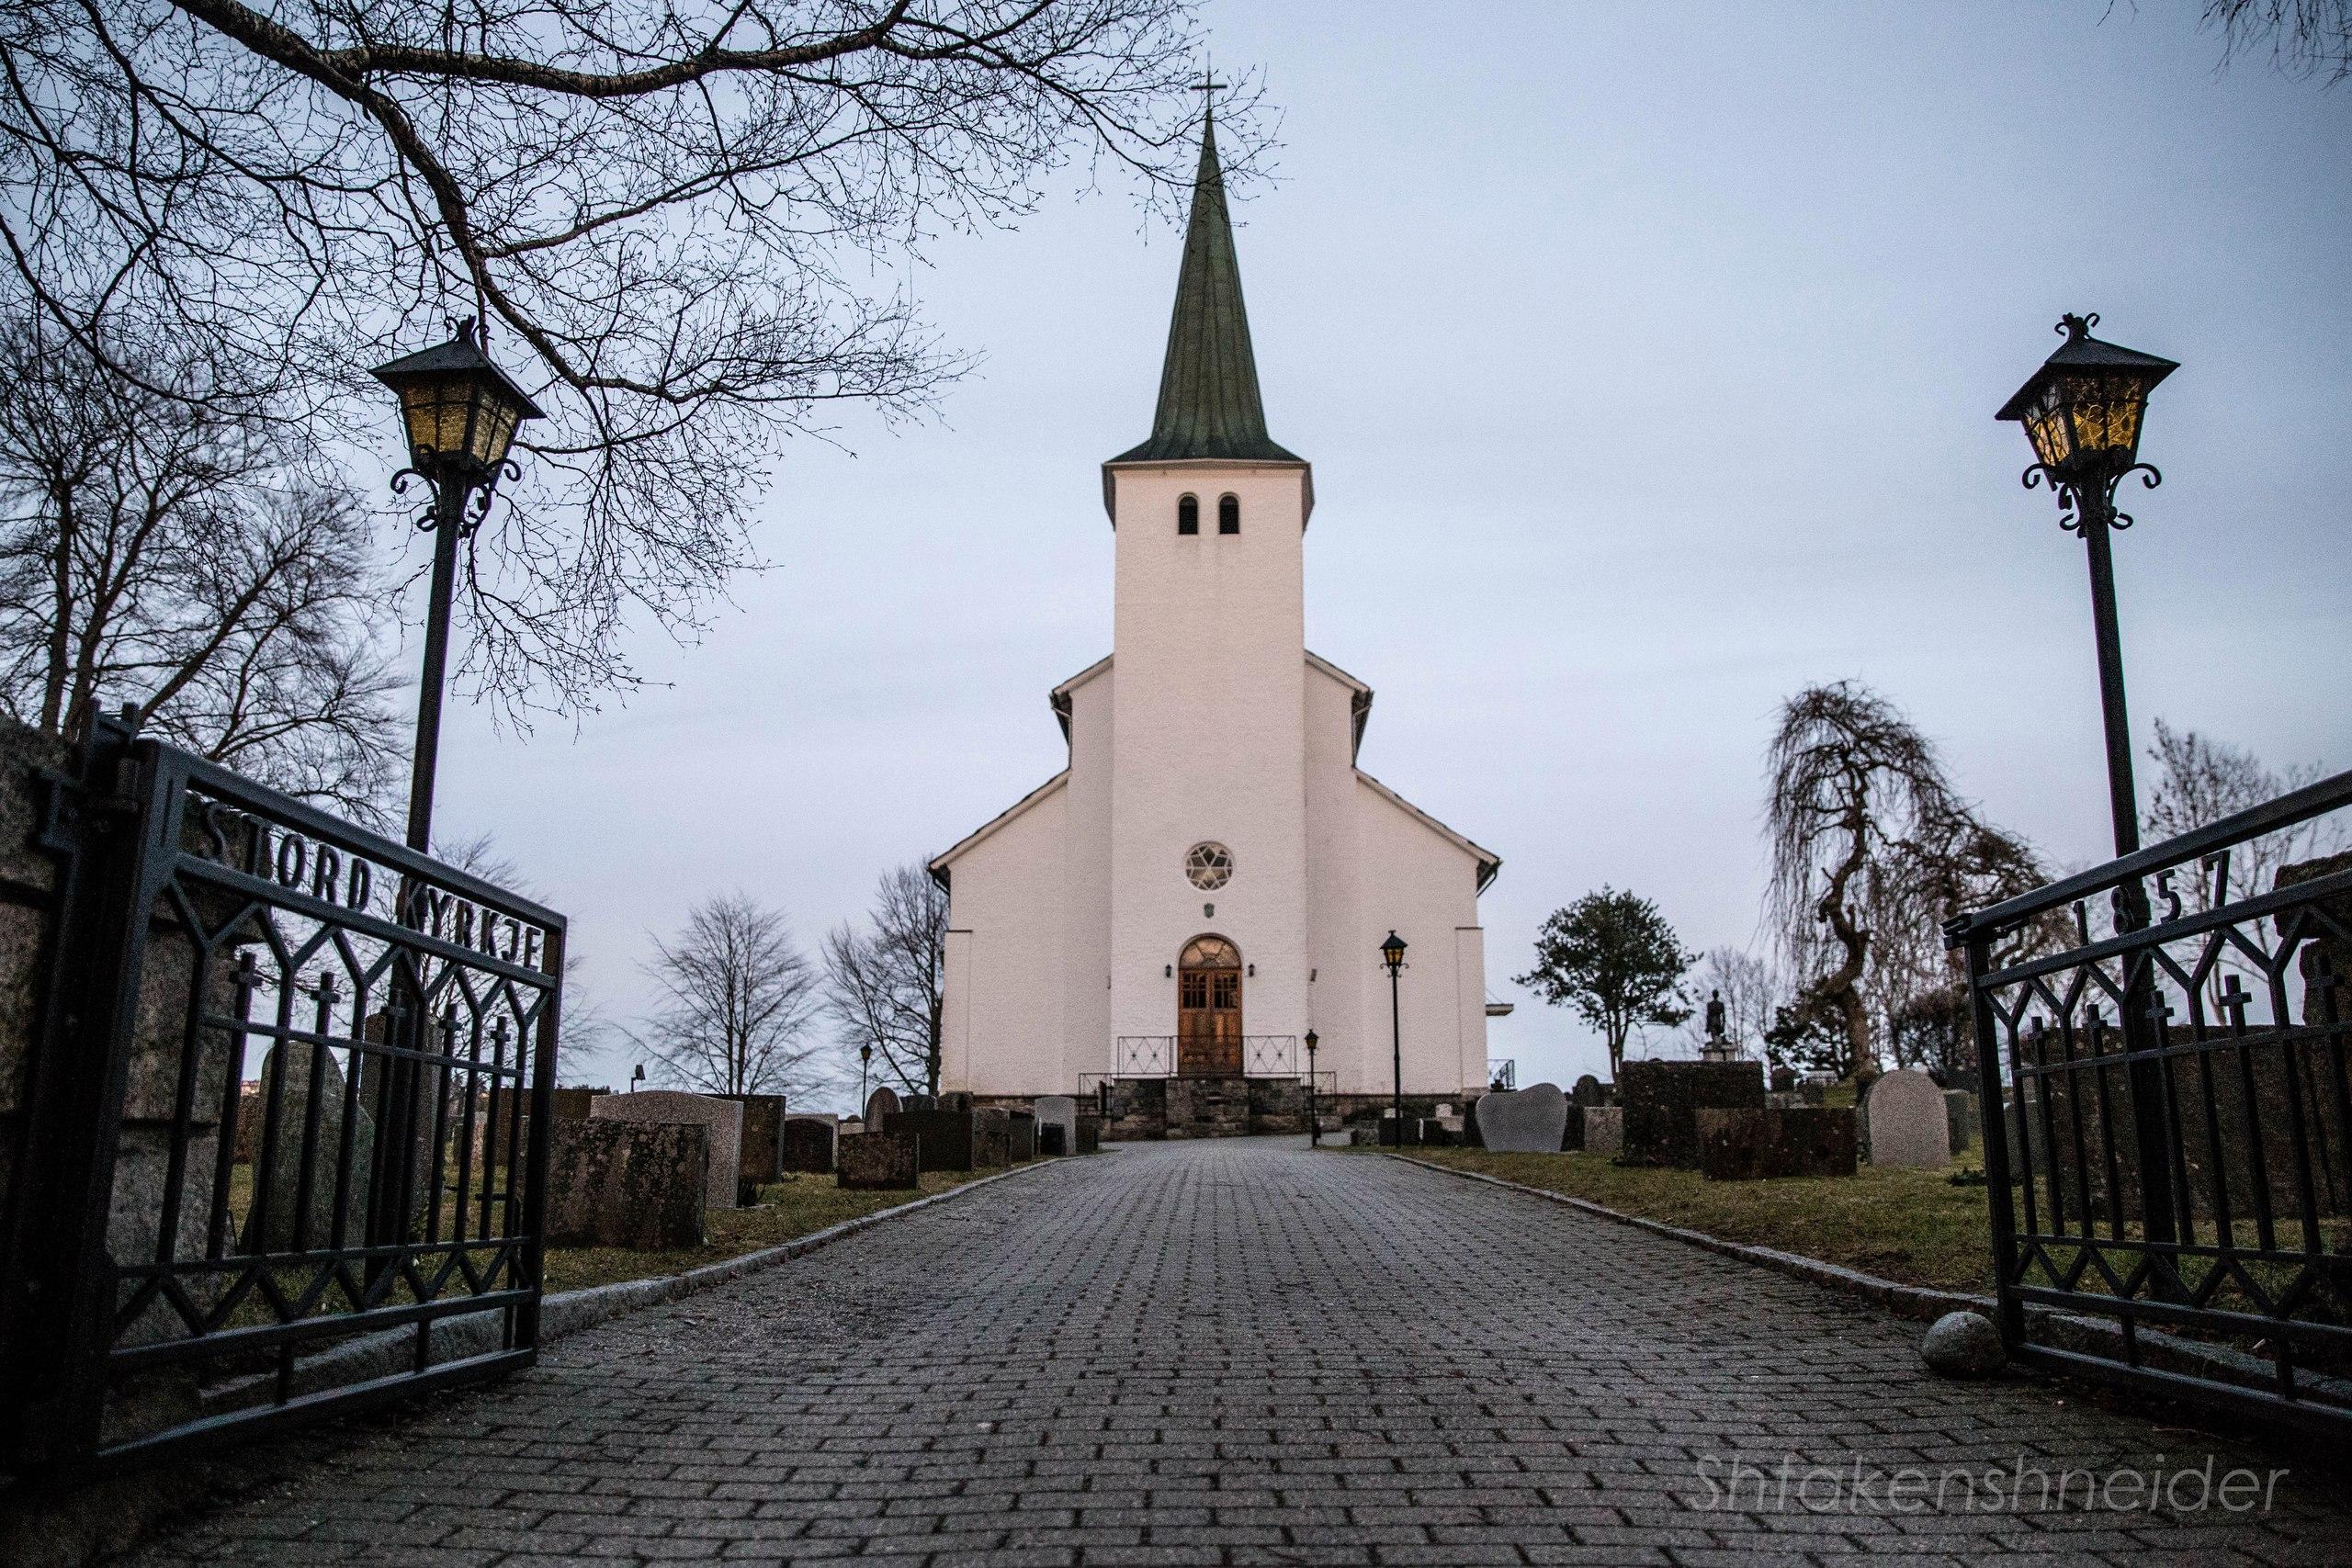 Stord Kyrkje и прилегающее кладбище в Лейрвике, Норвегия.